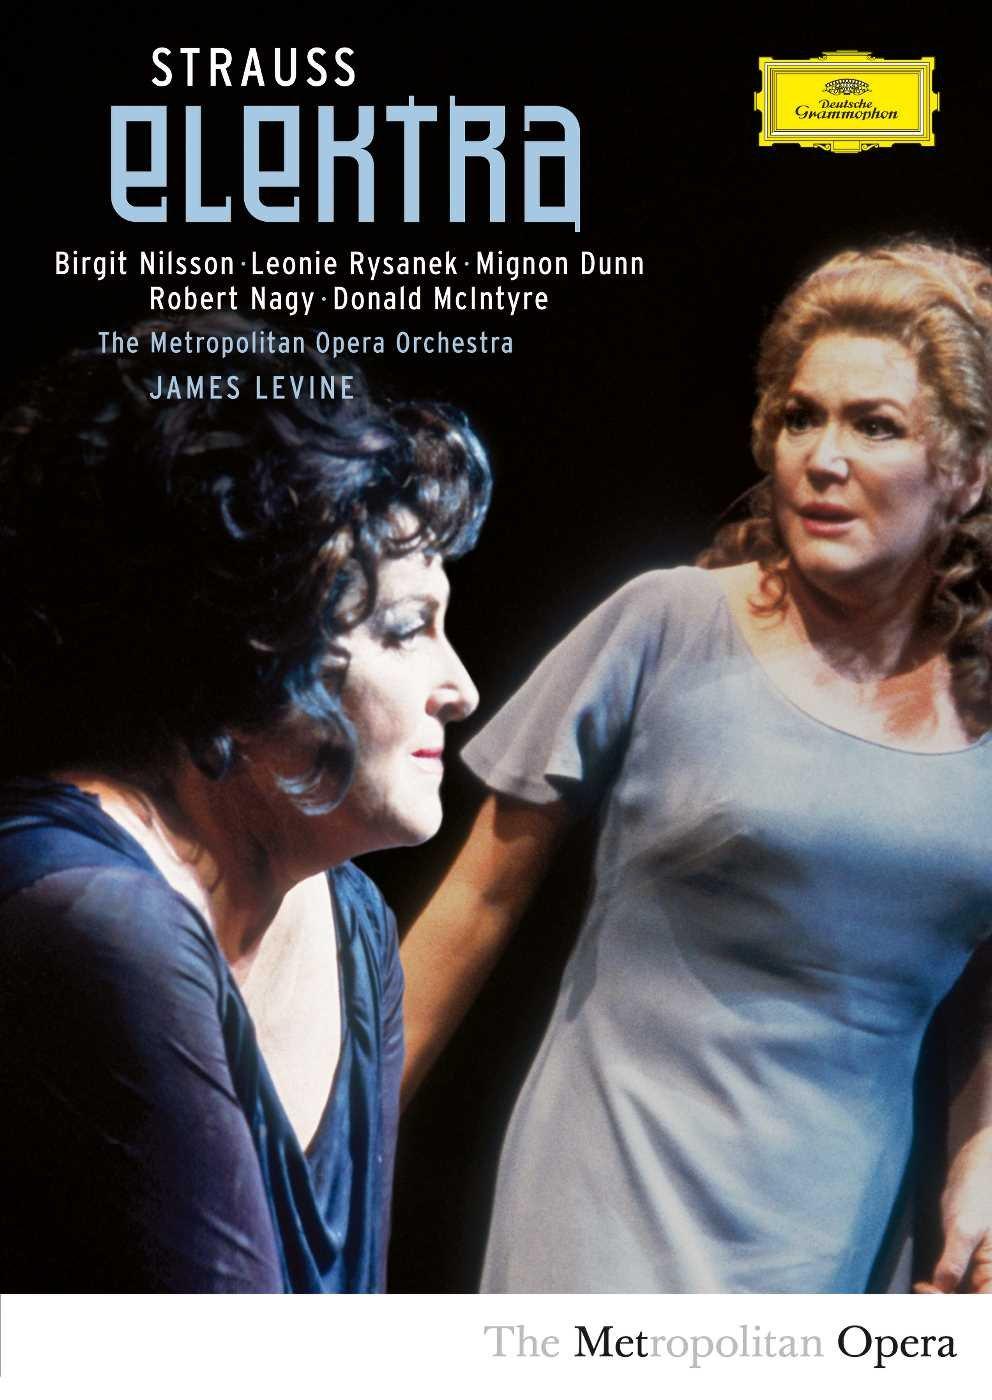 DVD : Birgit Nilsson - Elektra (Widescreen, Subtitled)